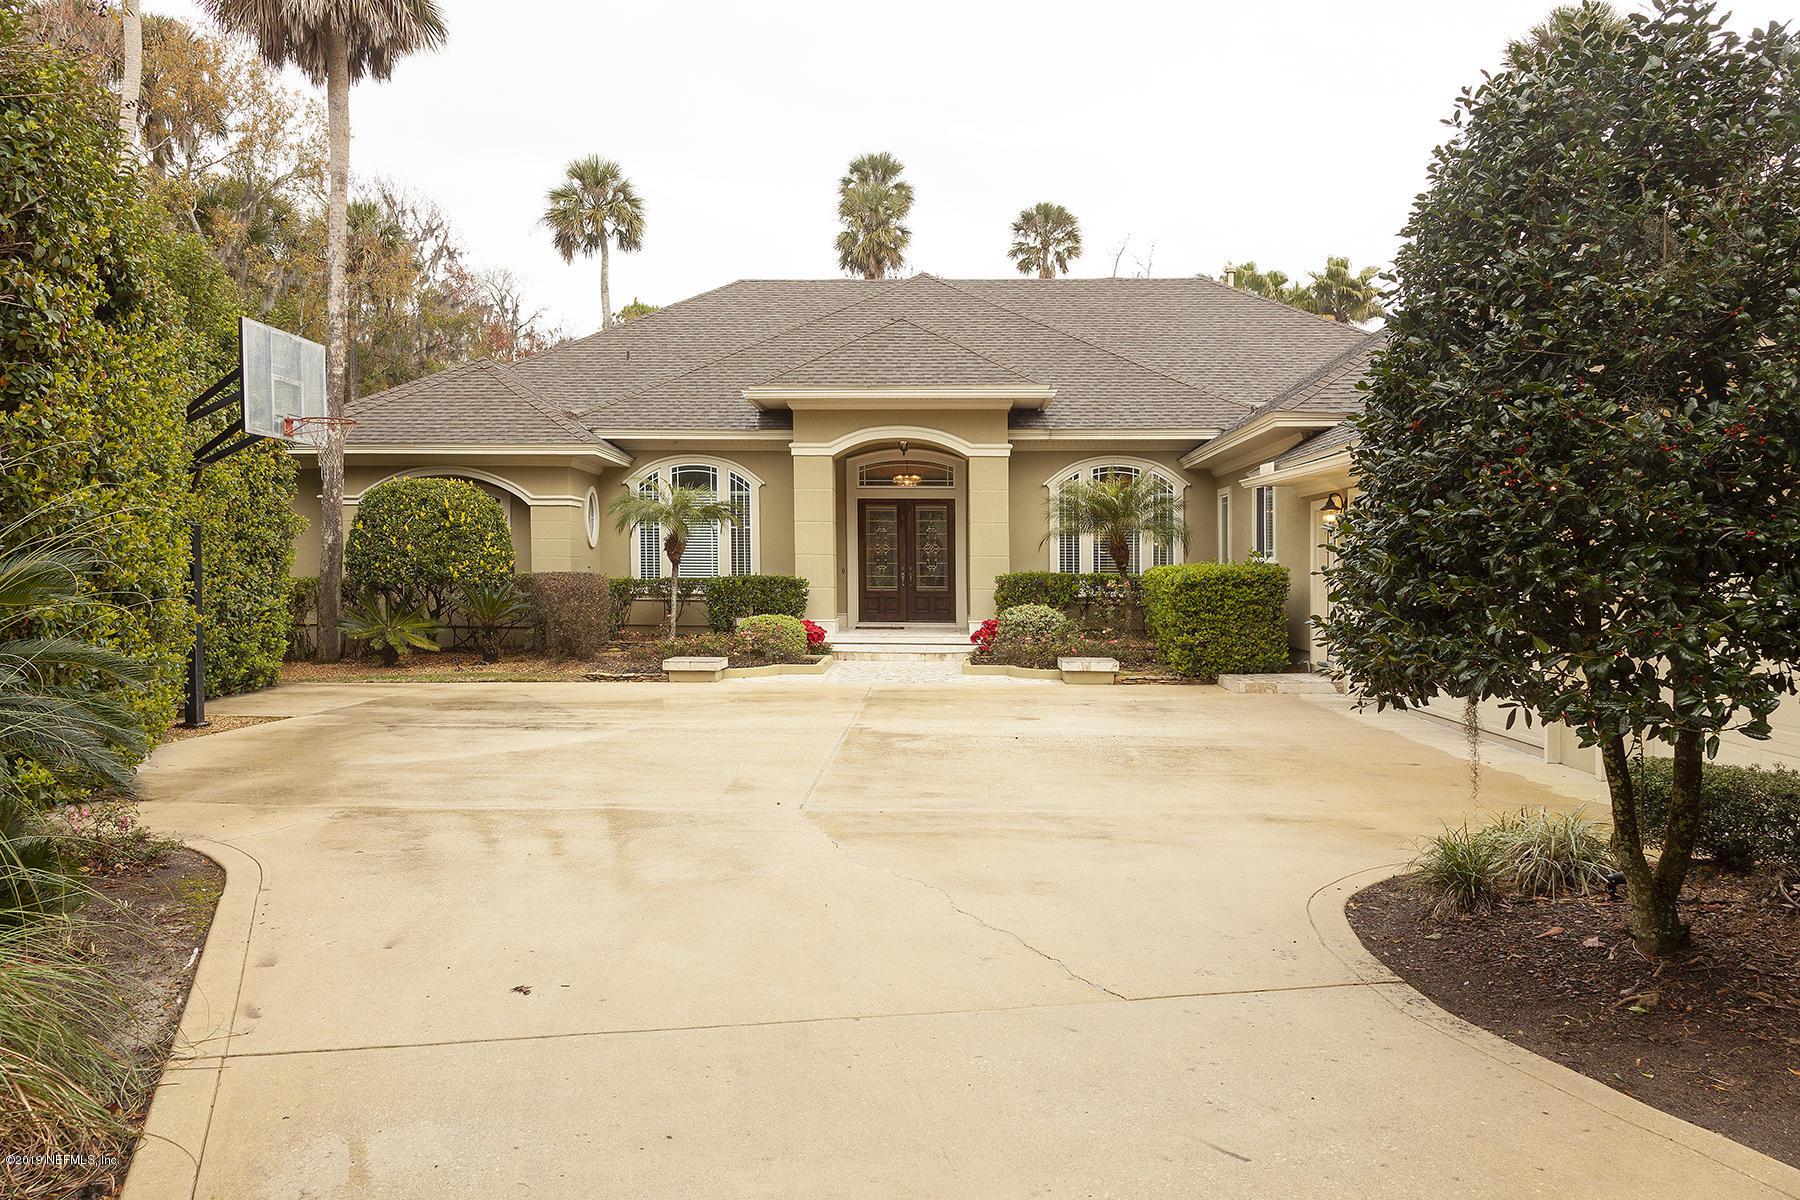 312 OSPREY NEST, PONTE VEDRA BEACH, FLORIDA 32082, 5 Bedrooms Bedrooms, ,5 BathroomsBathrooms,Residential - single family,For sale,OSPREY NEST,978438